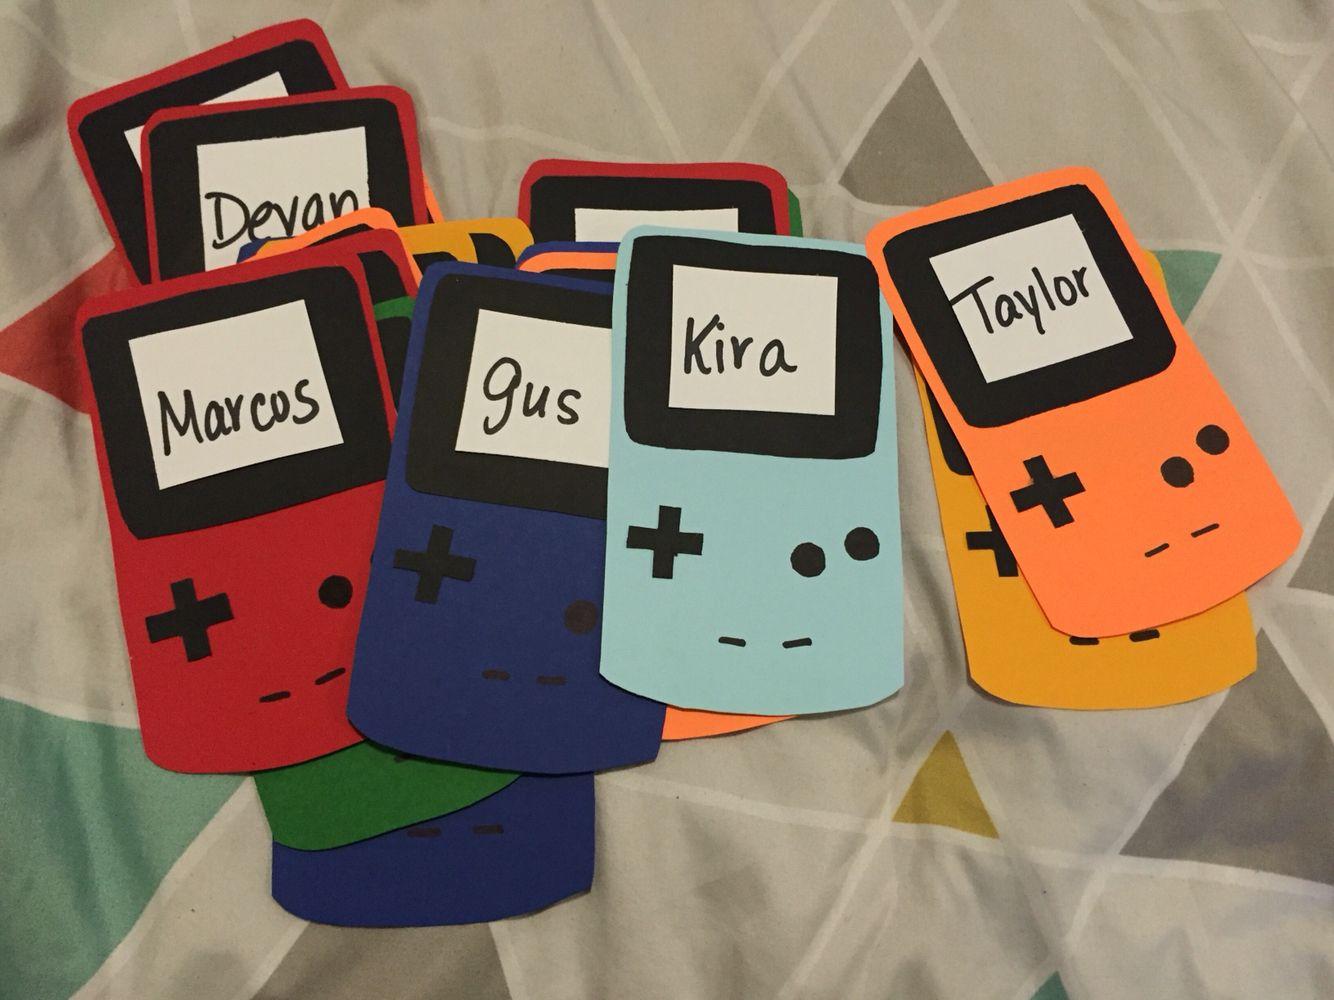 Made Game Boy door decs at Casas #UNM & Made Game Boy door decs at Casas #UNM | Door Decs | Pinterest ... Pezcame.Com